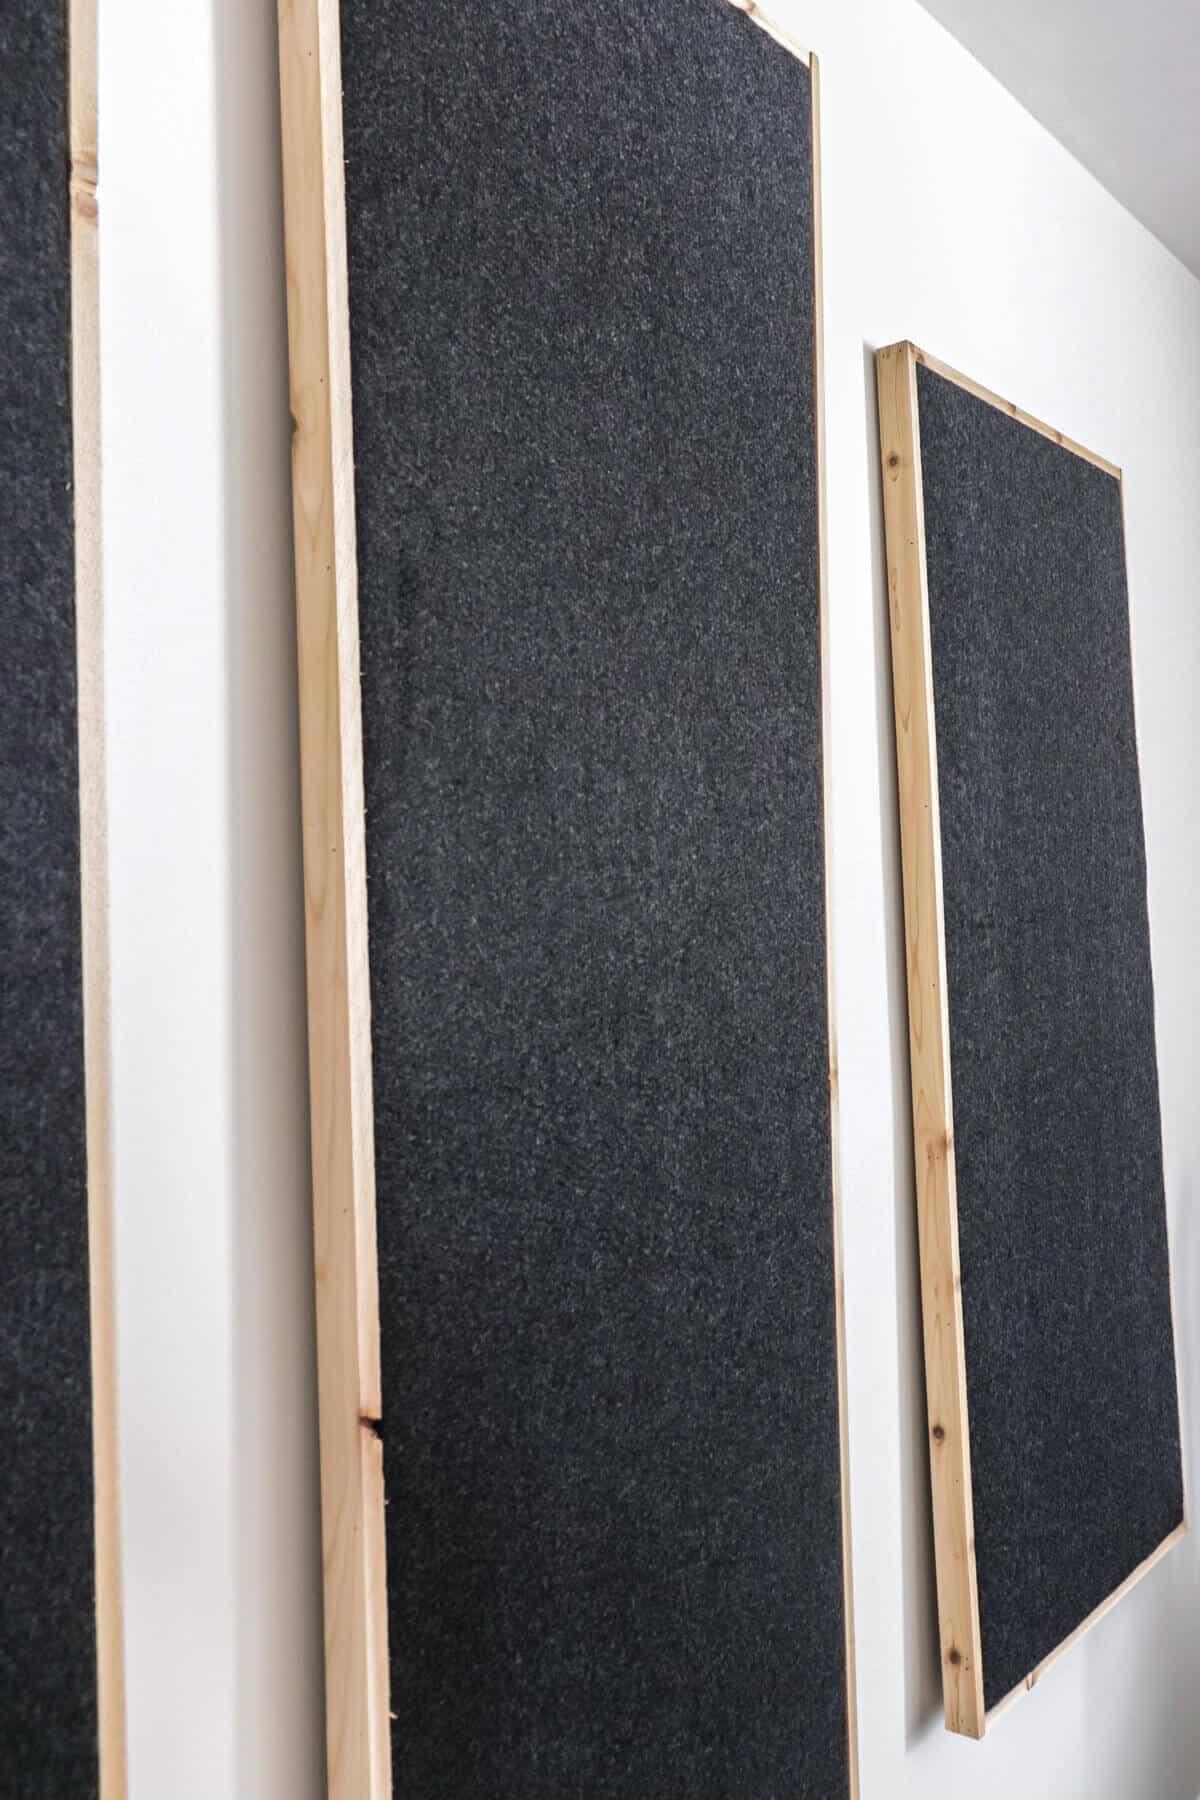 charcoal felt fabric sound panels wrapped in cedar trim